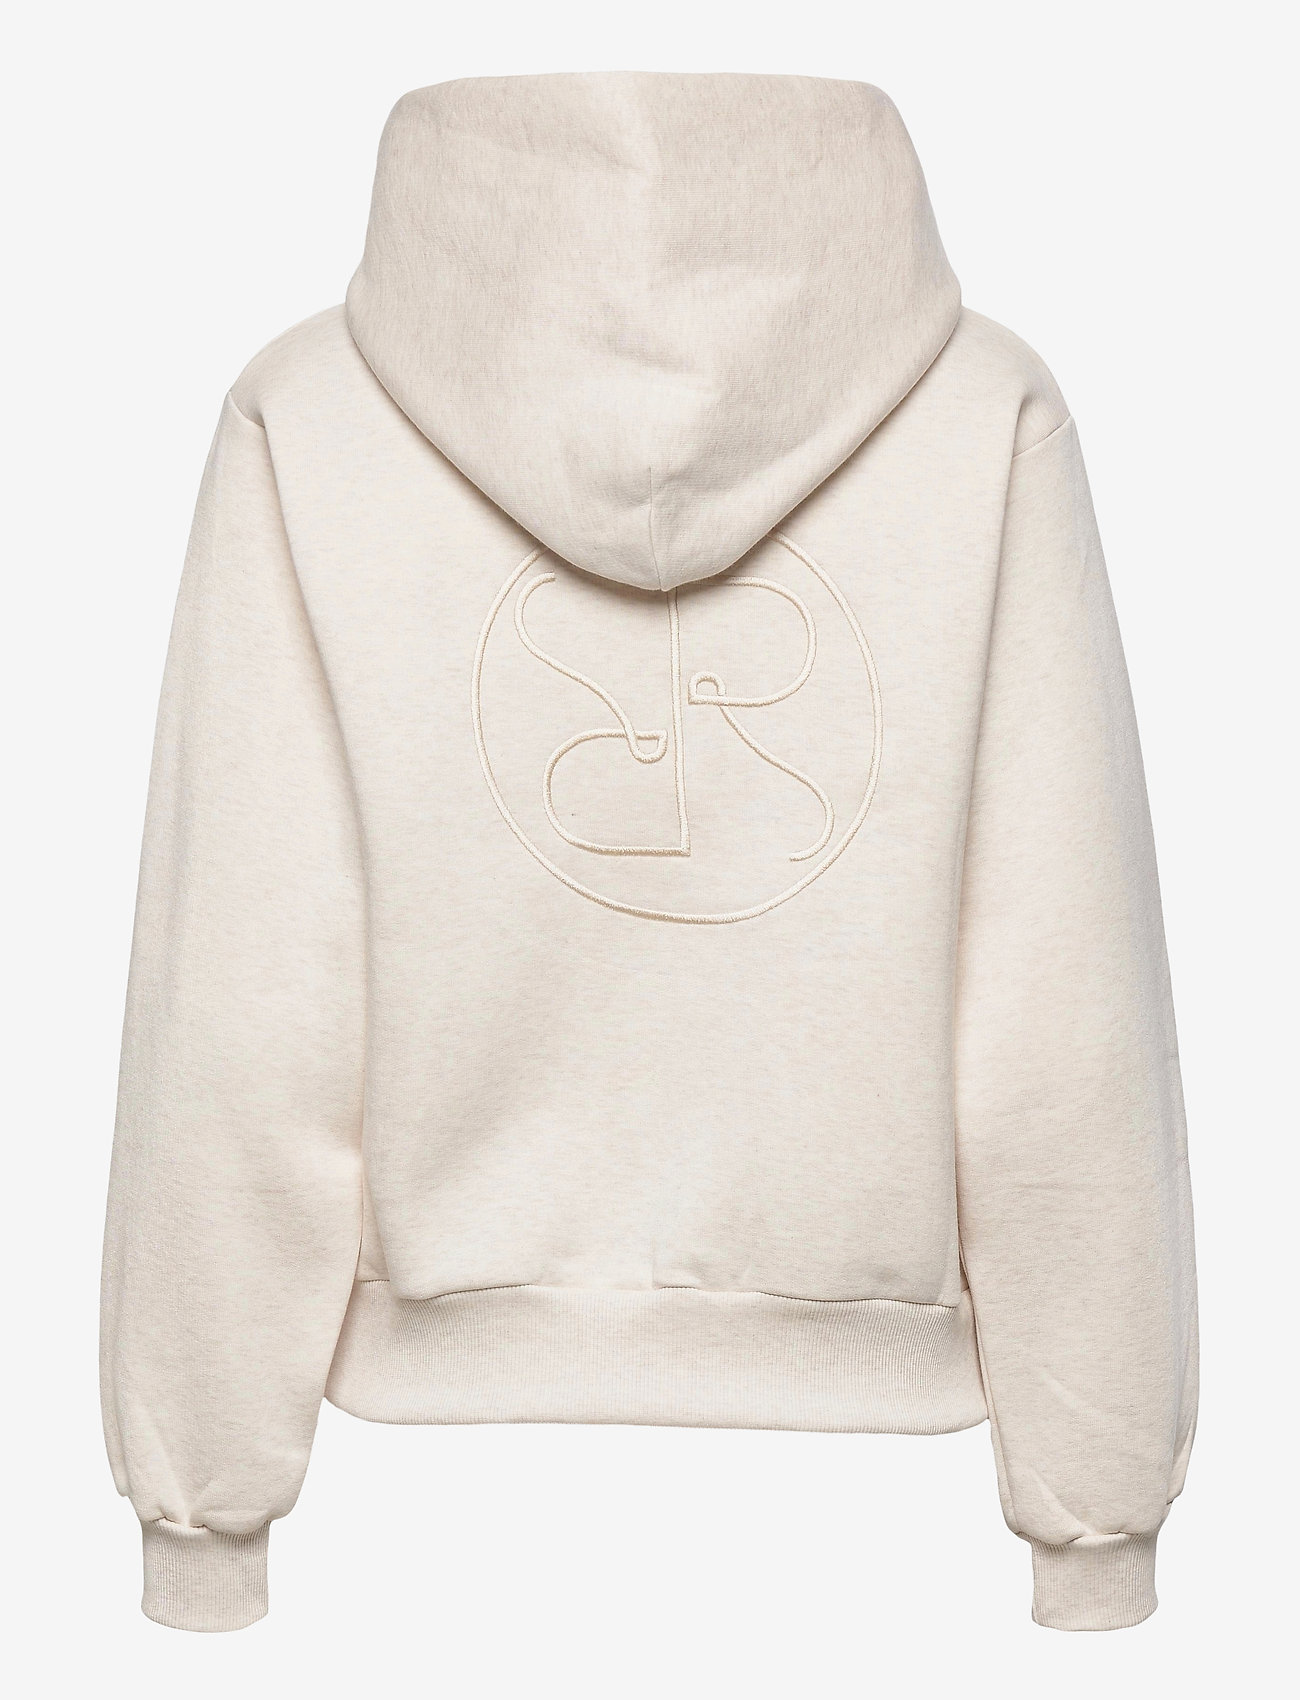 RODEBJER - RODEBJER MONOGRAM - sweatshirts & hættetrøjer - puffy white - 1